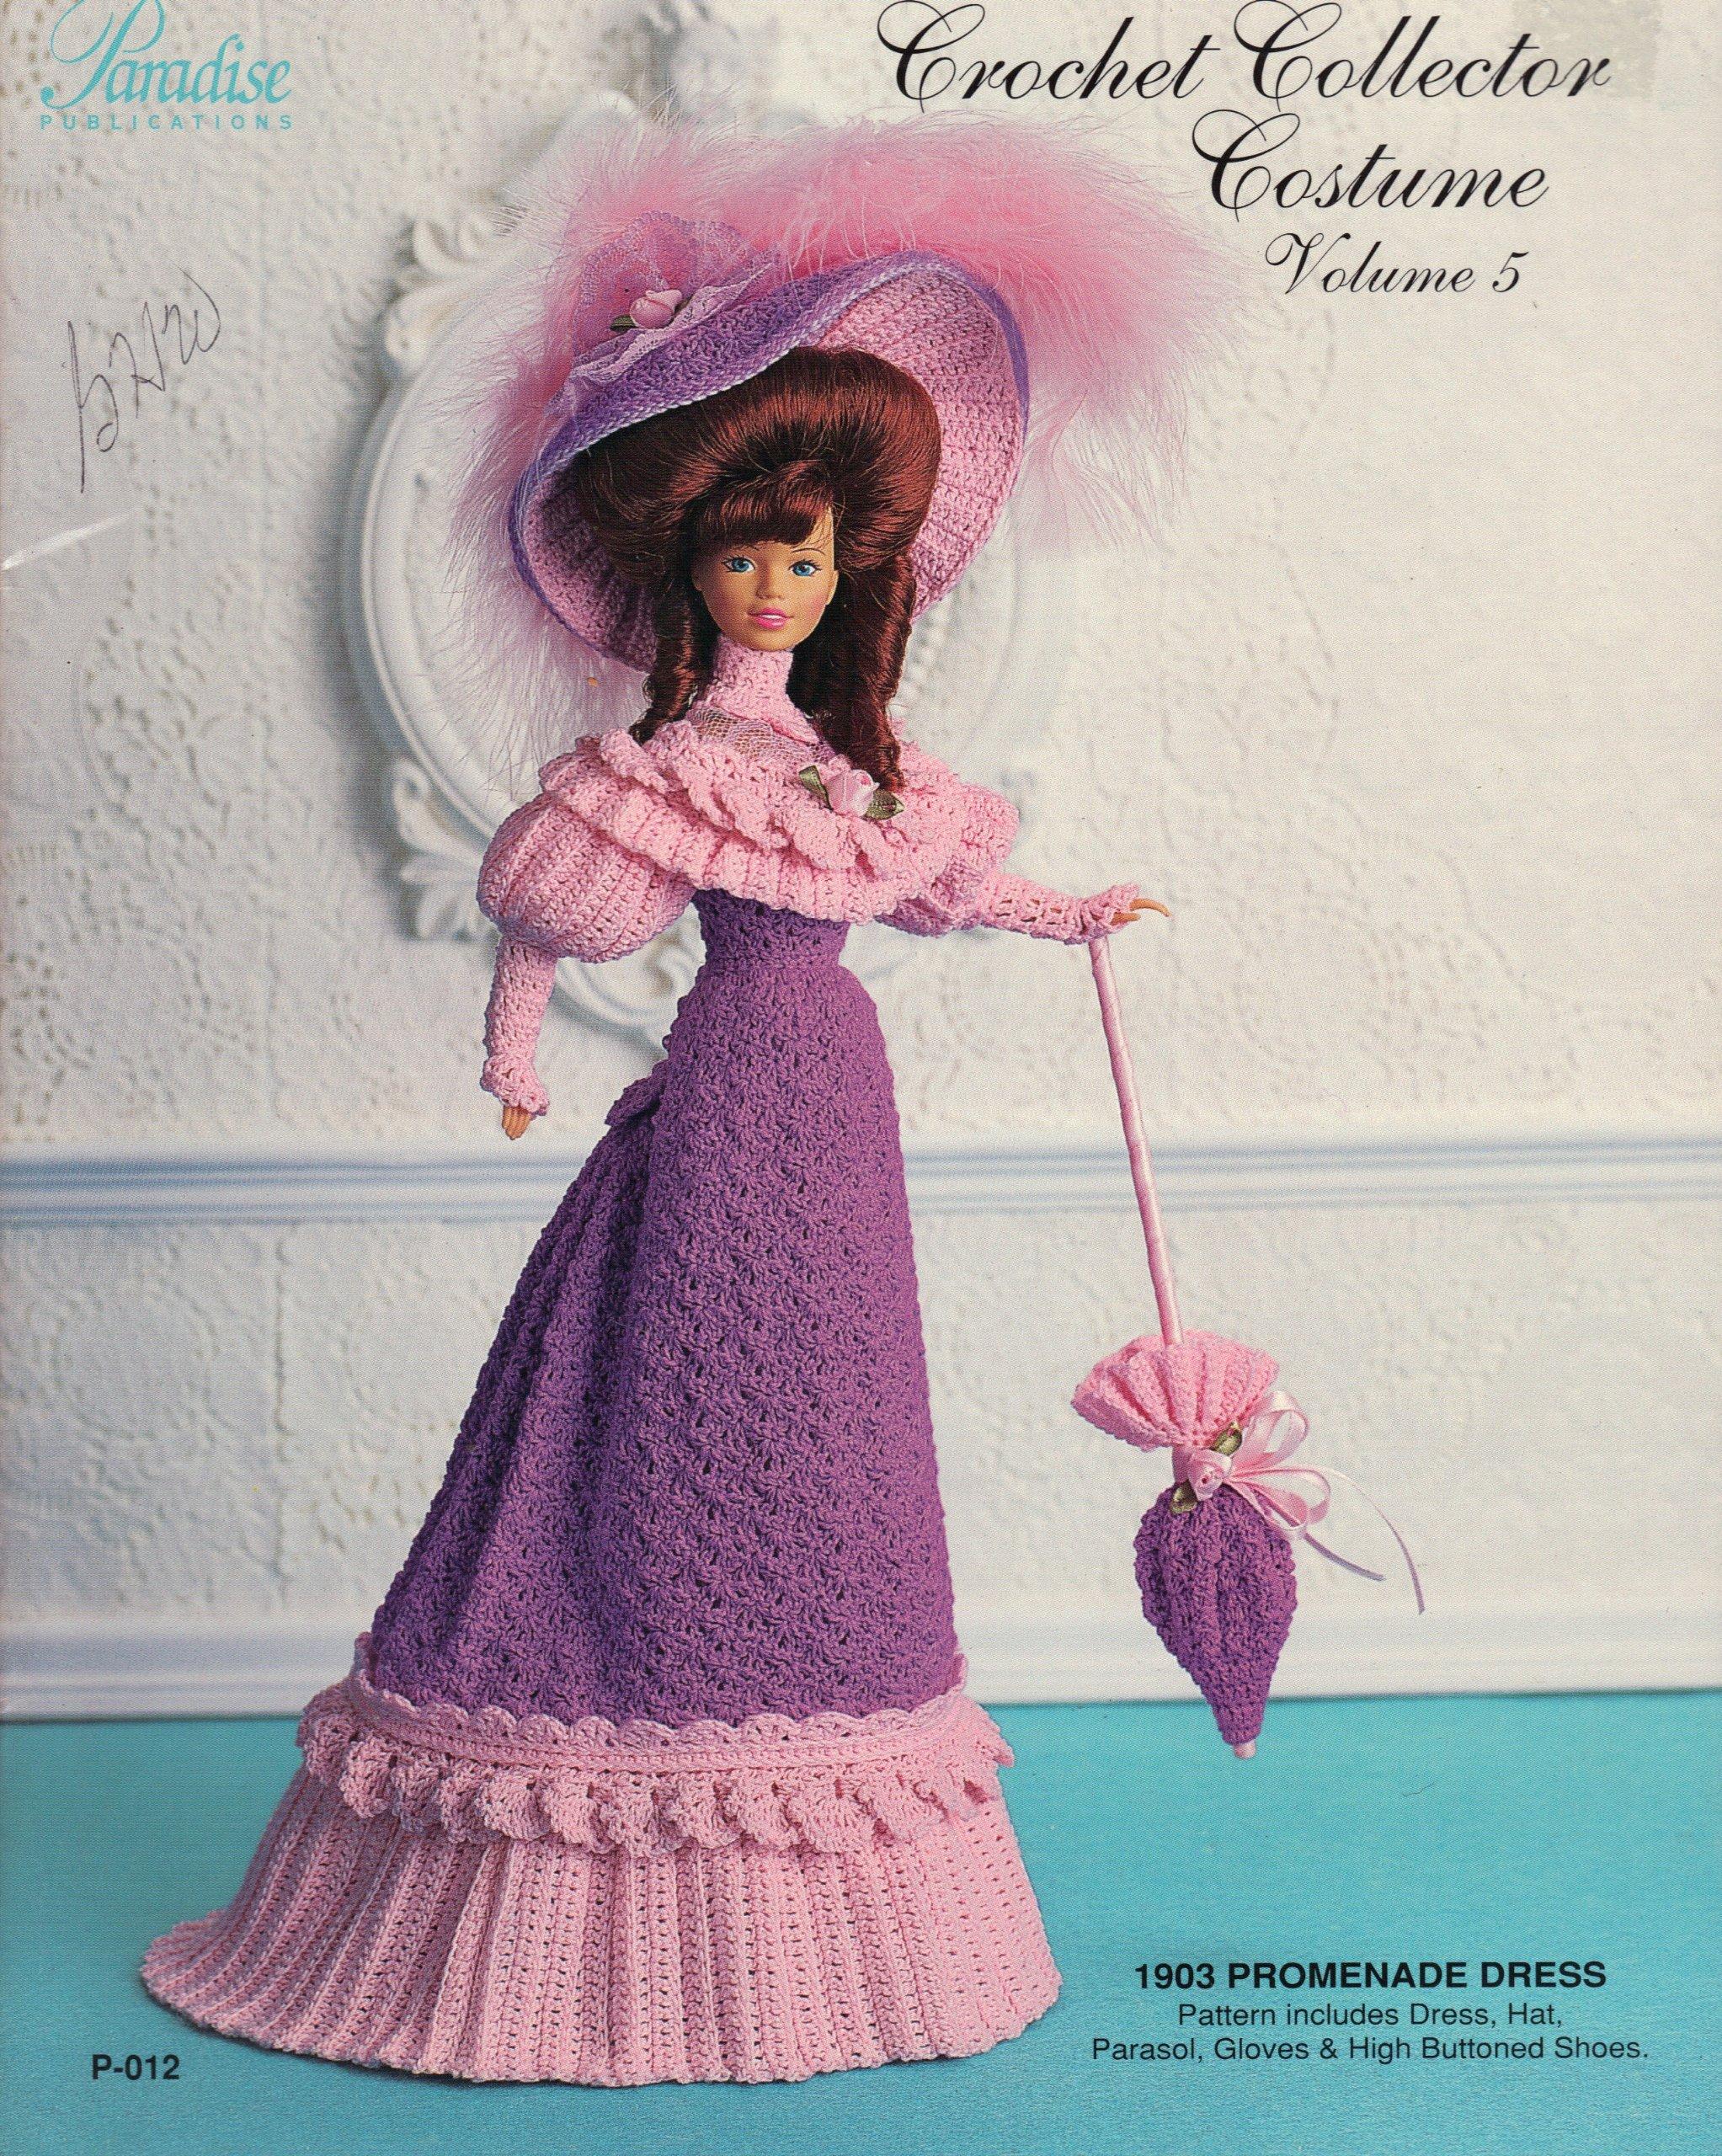 Crochet Collector Costume (1903 Promenade Dress, Vol. 5)